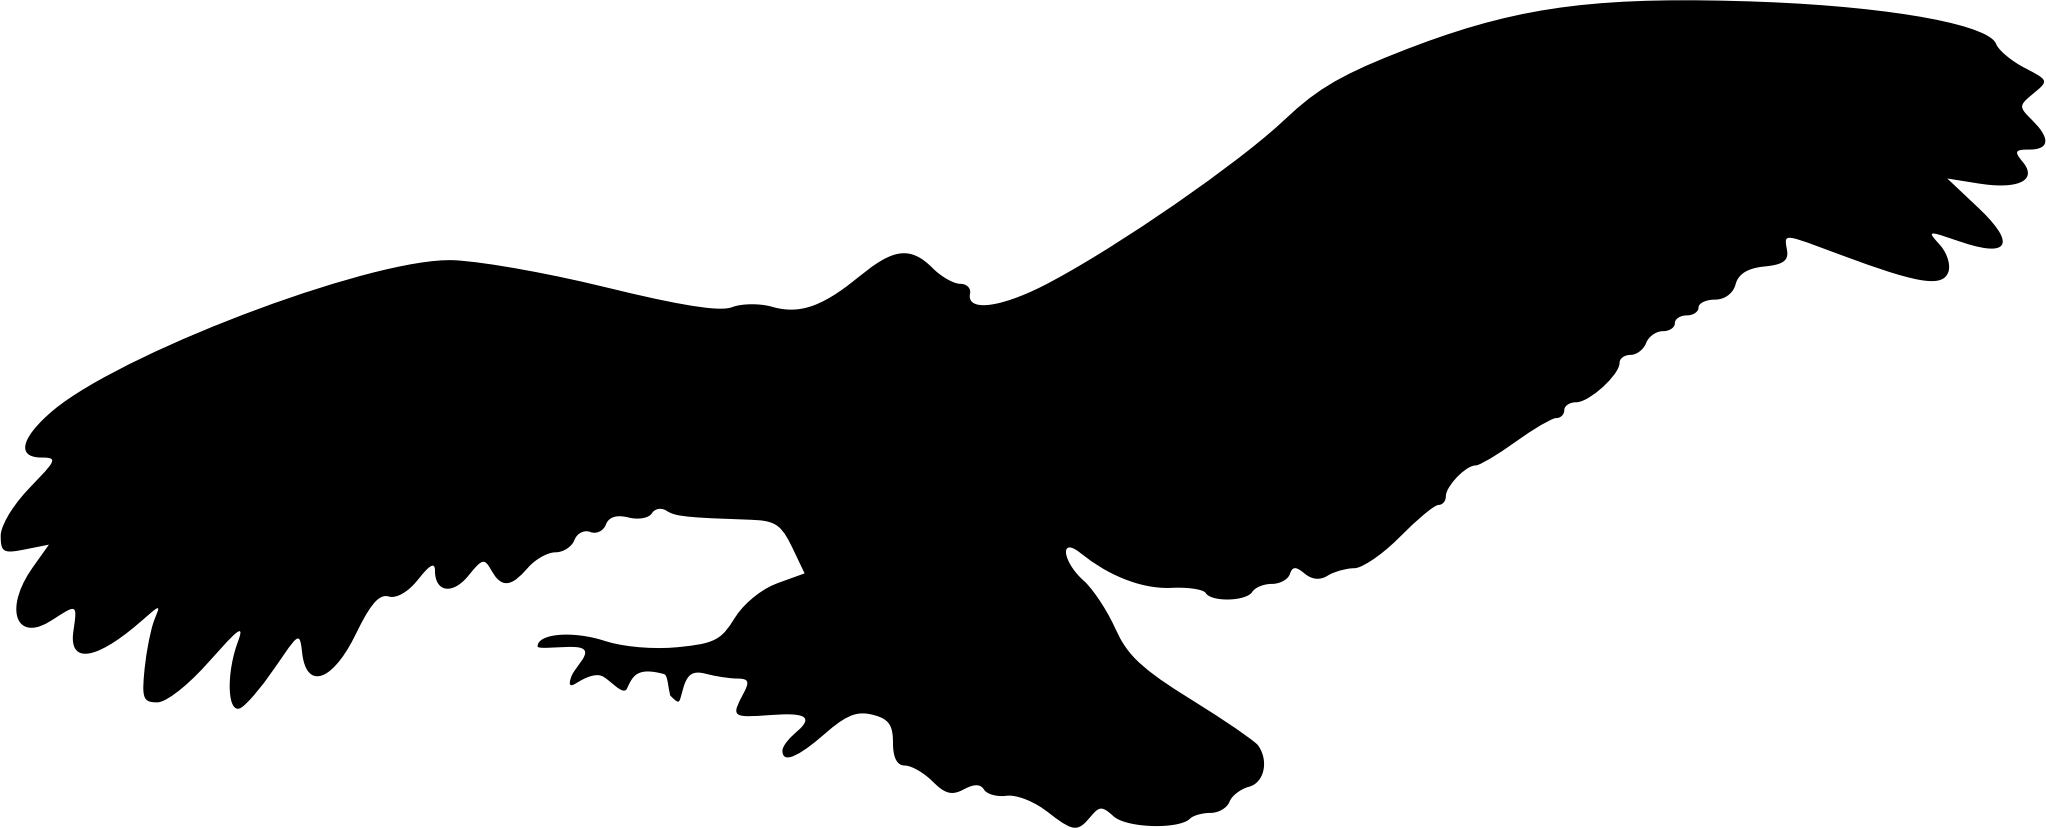 2046x828 Black Eagle Clipart Silhouette